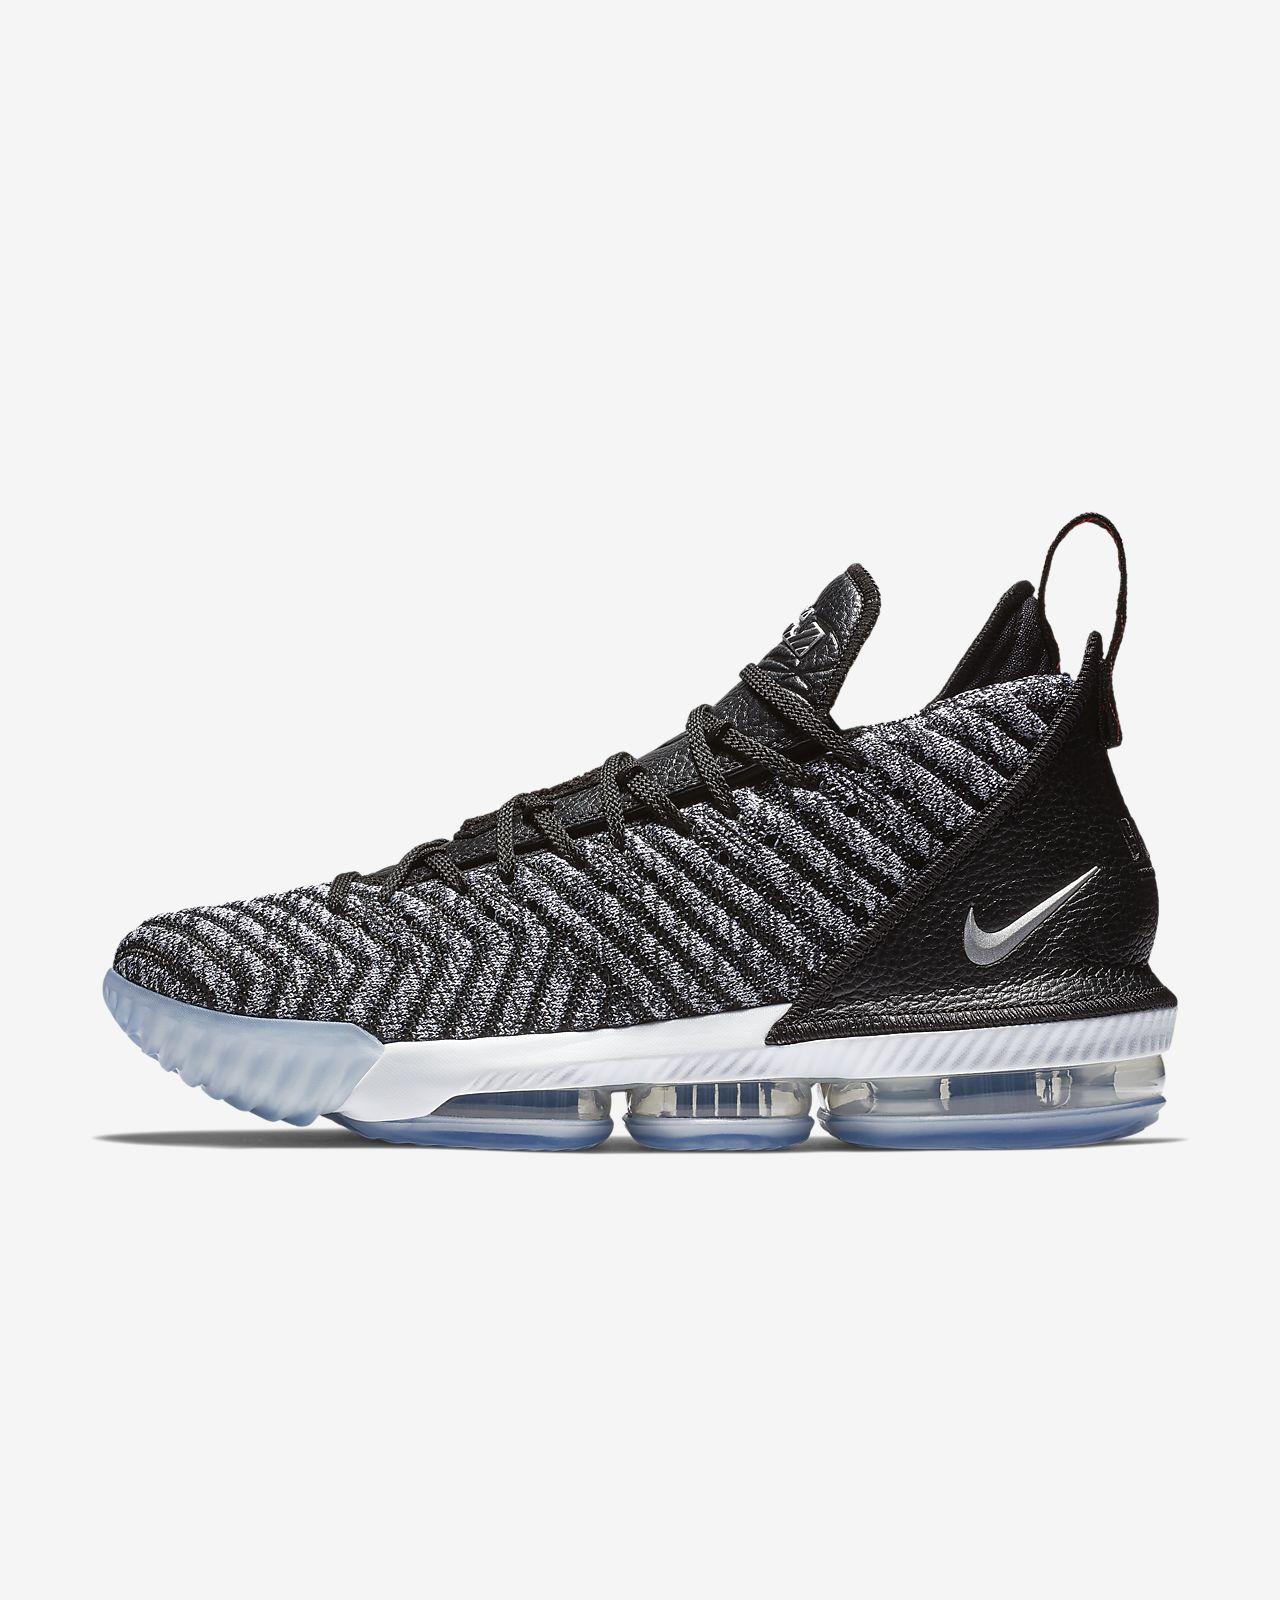 hot sale online 71a1c 89bb5 ... LeBron 16 Zapatillas de baloncesto